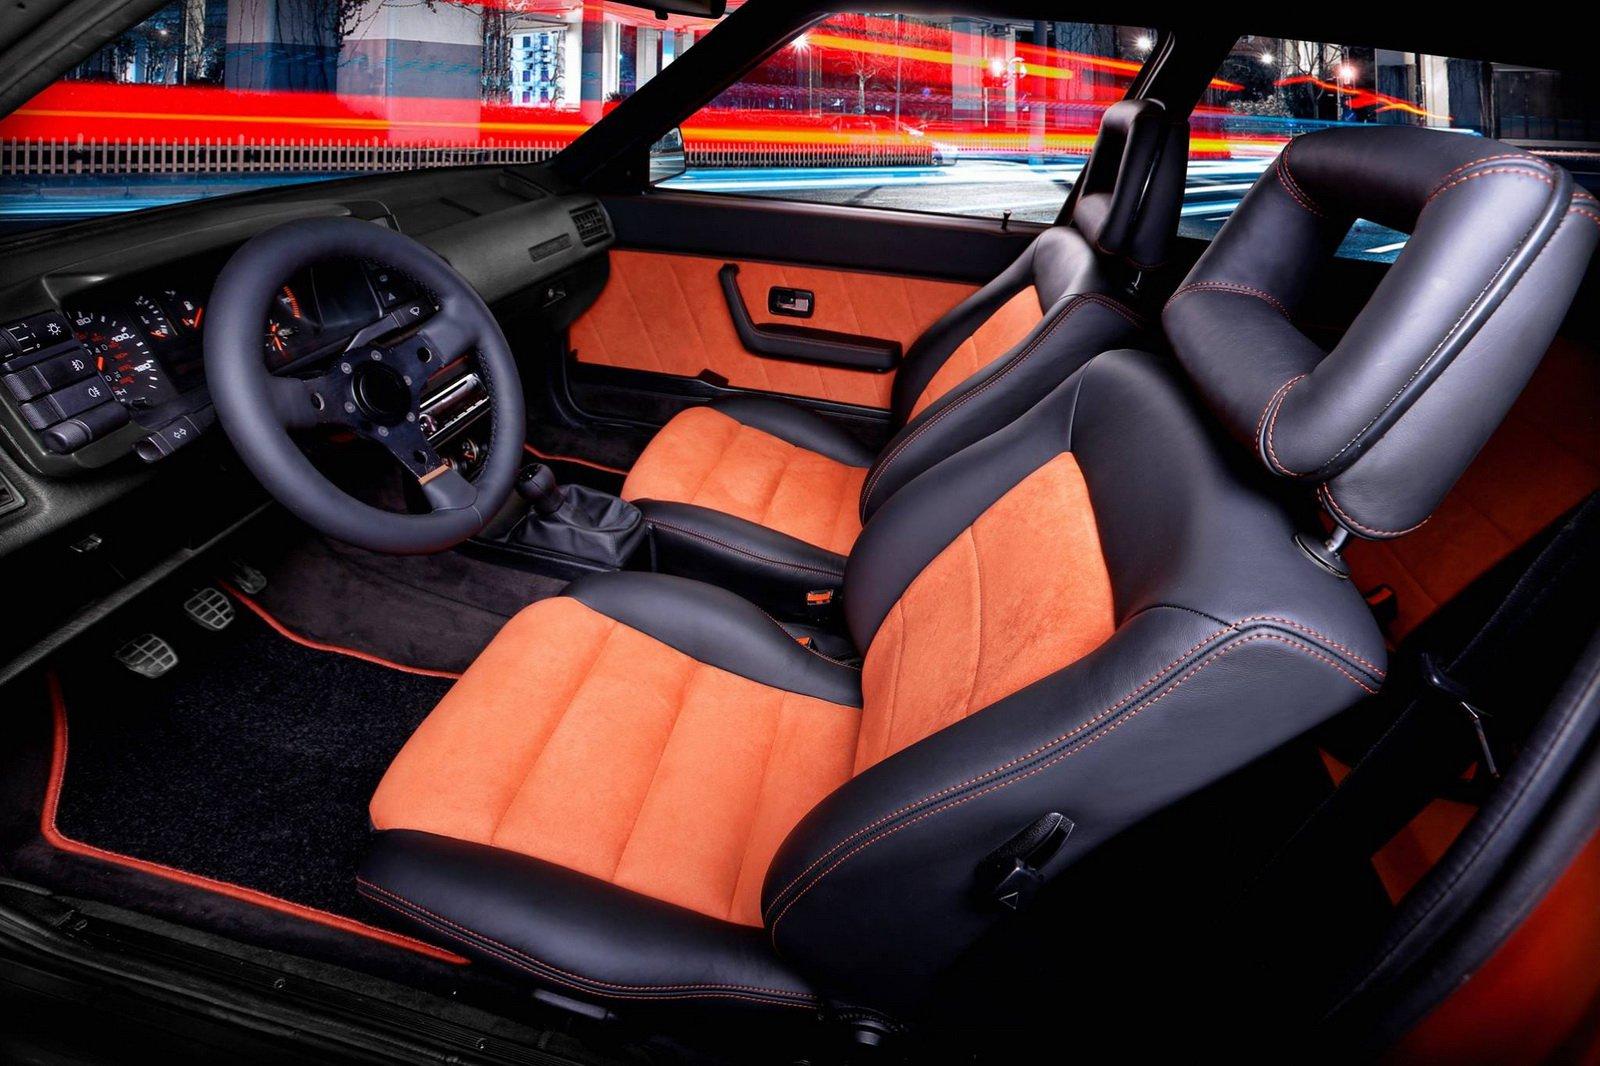 1477150819 audi coupe 11 - Carbon Motors преобразили интерьер Audi B2